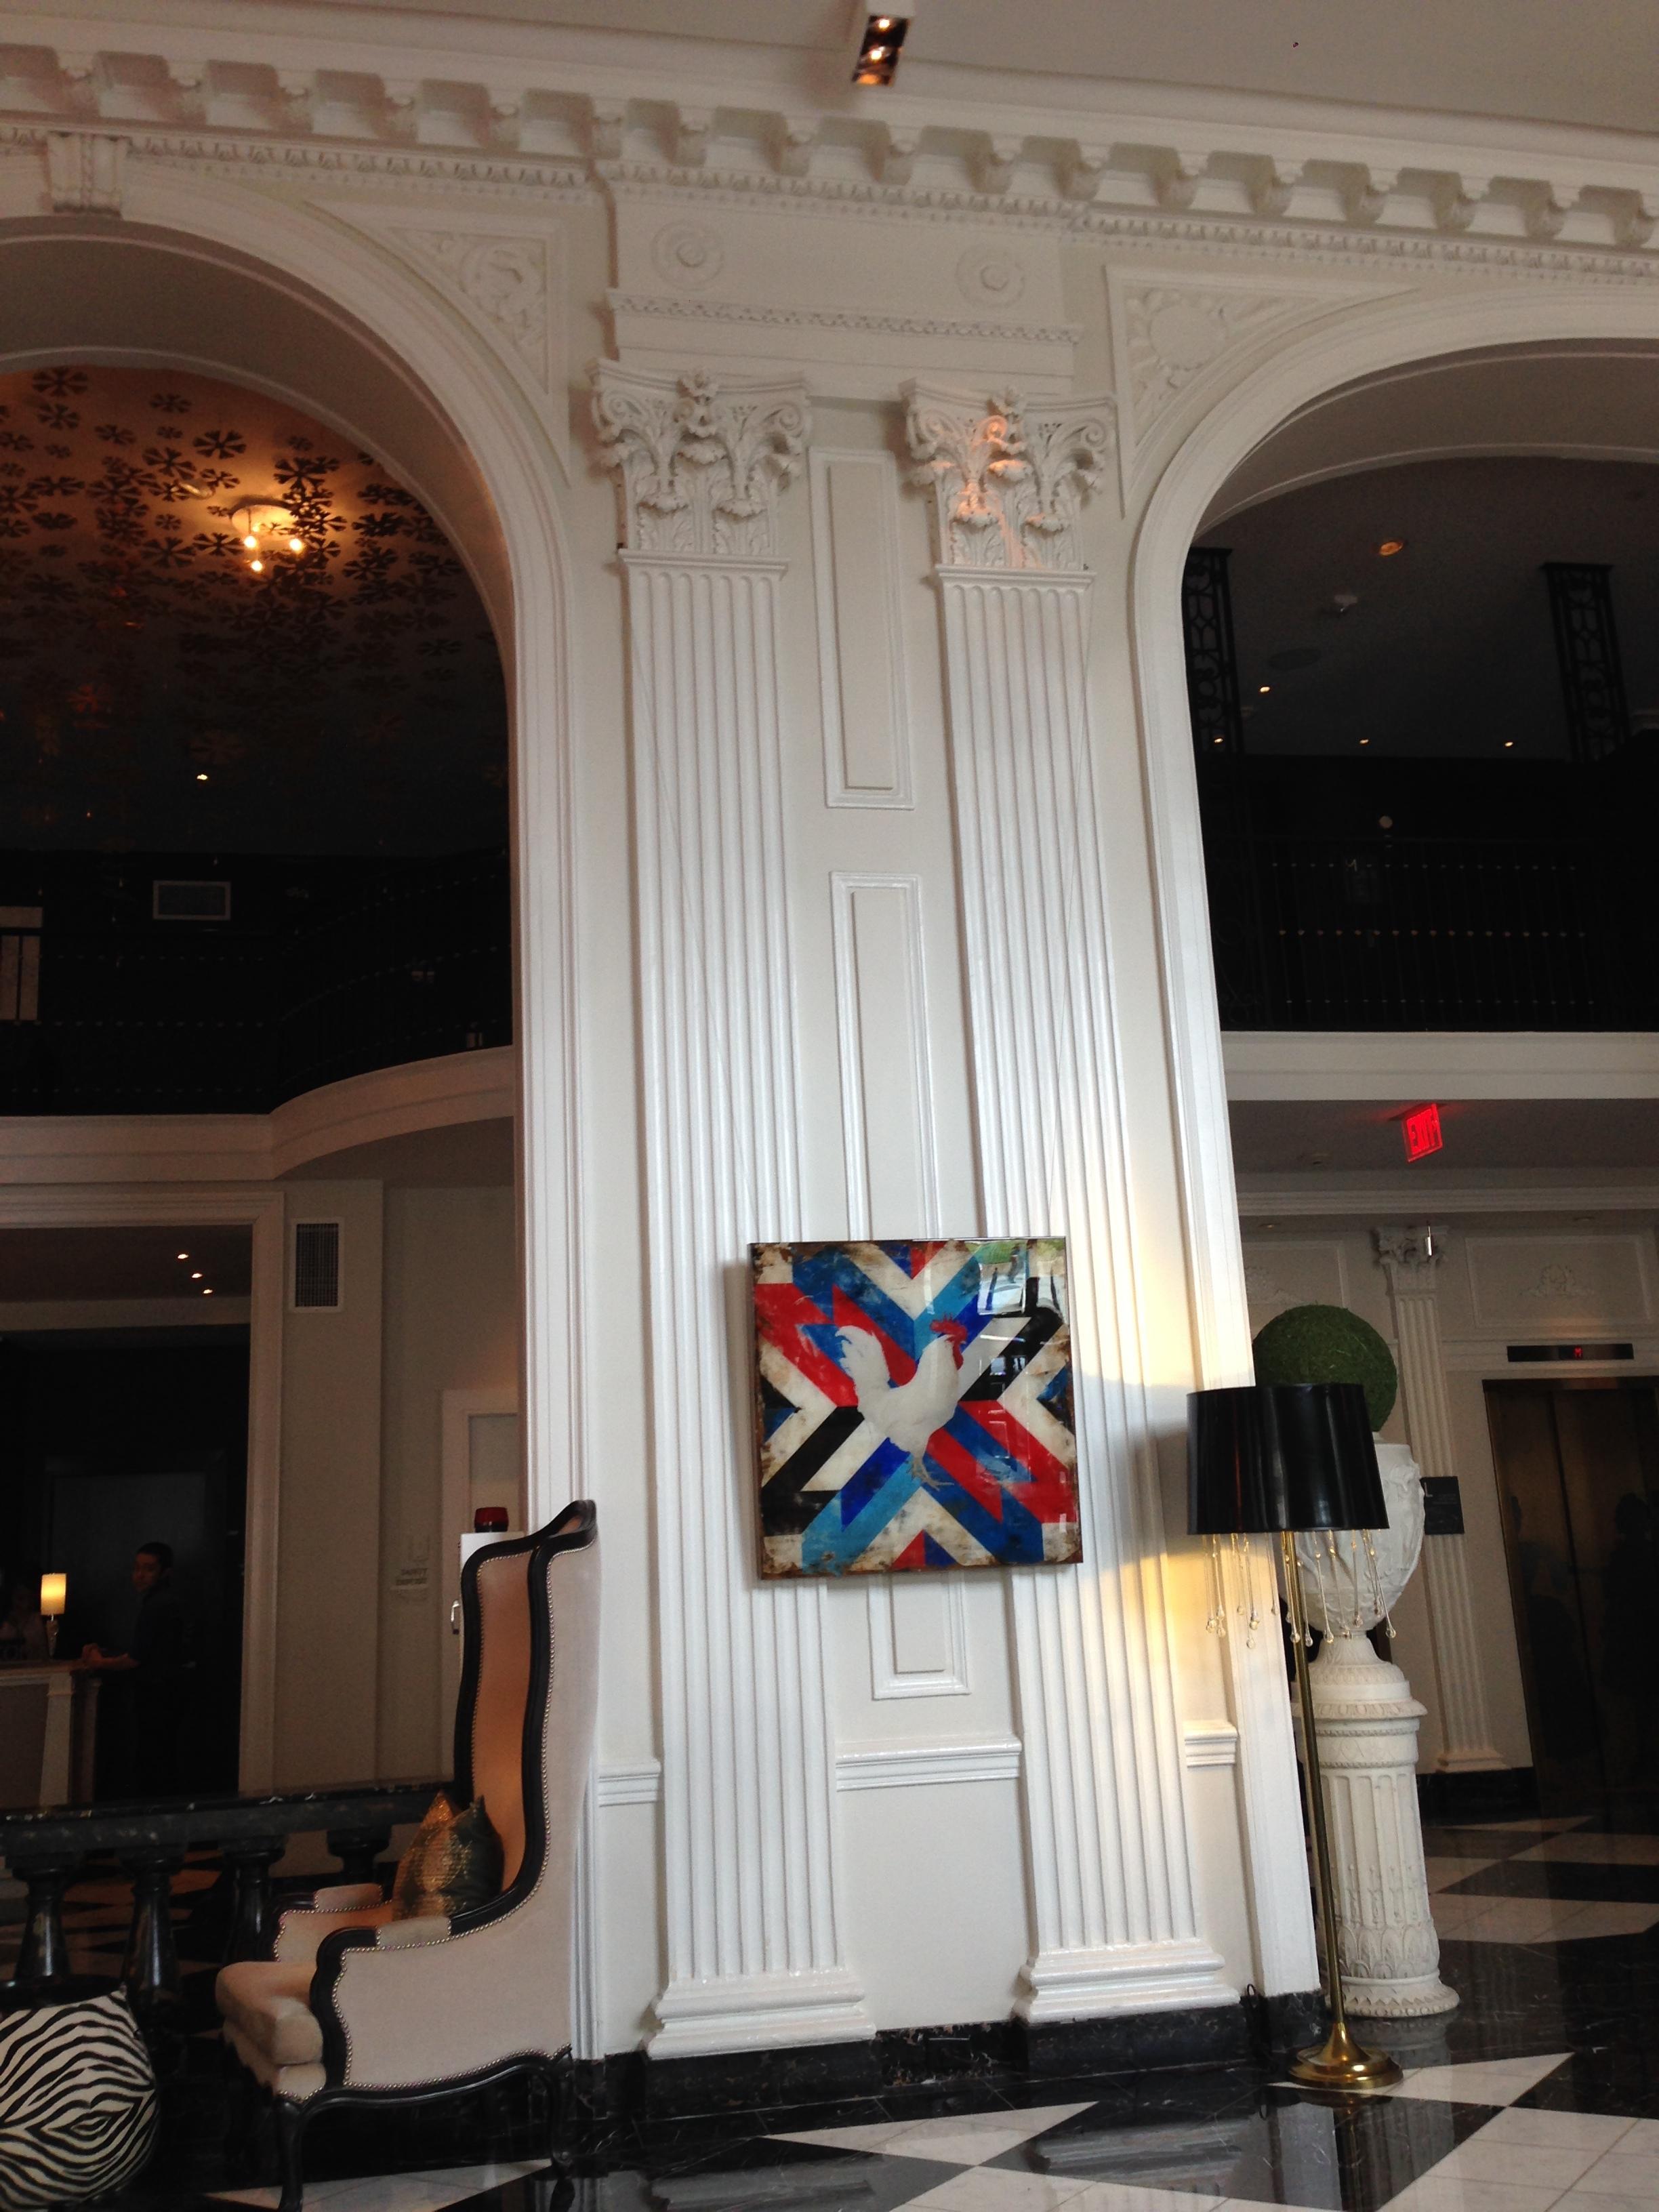 THE W HOTEL, WASHINGTON, DC